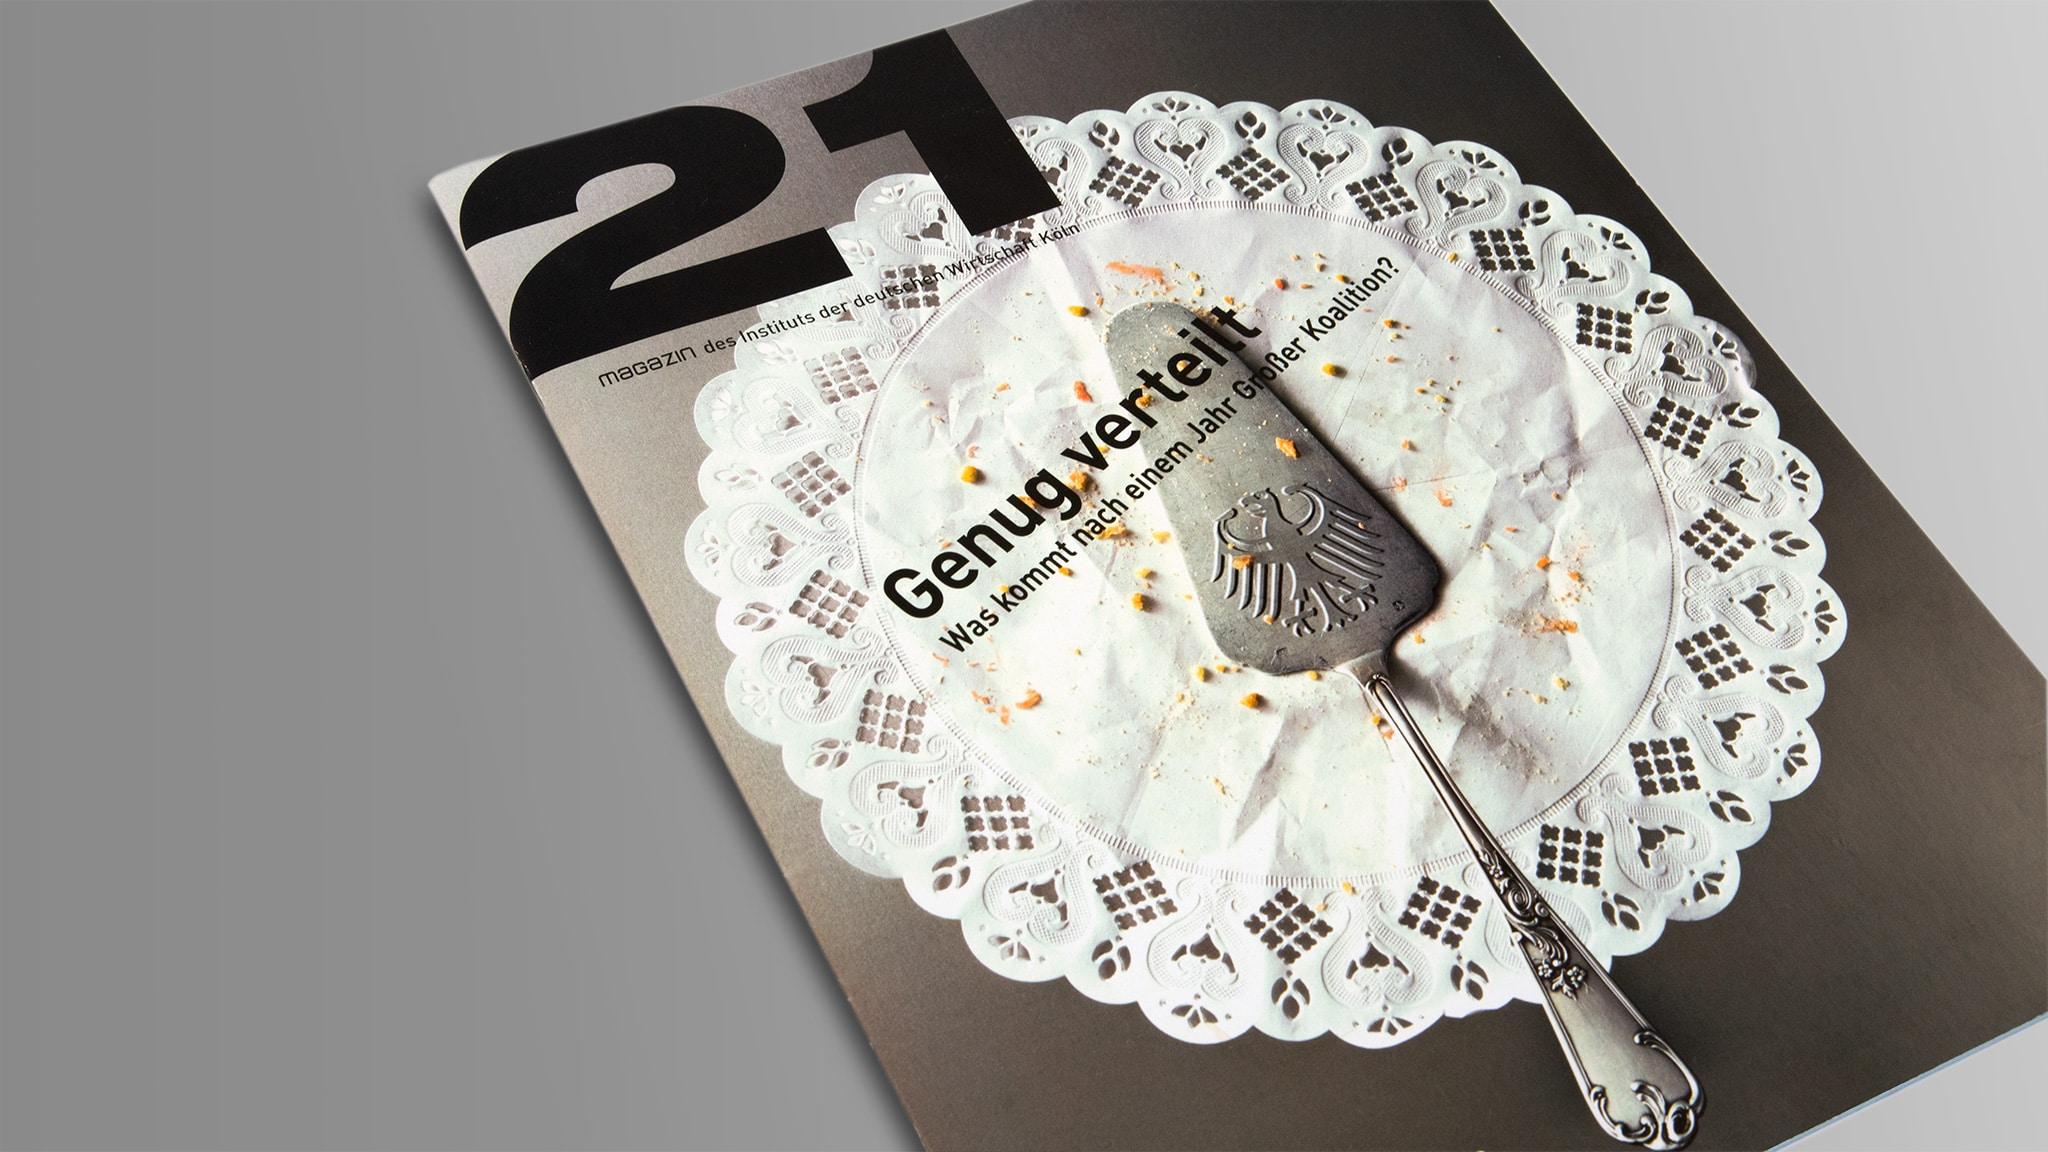 16_Magazin-21-Editorial-Design-1.